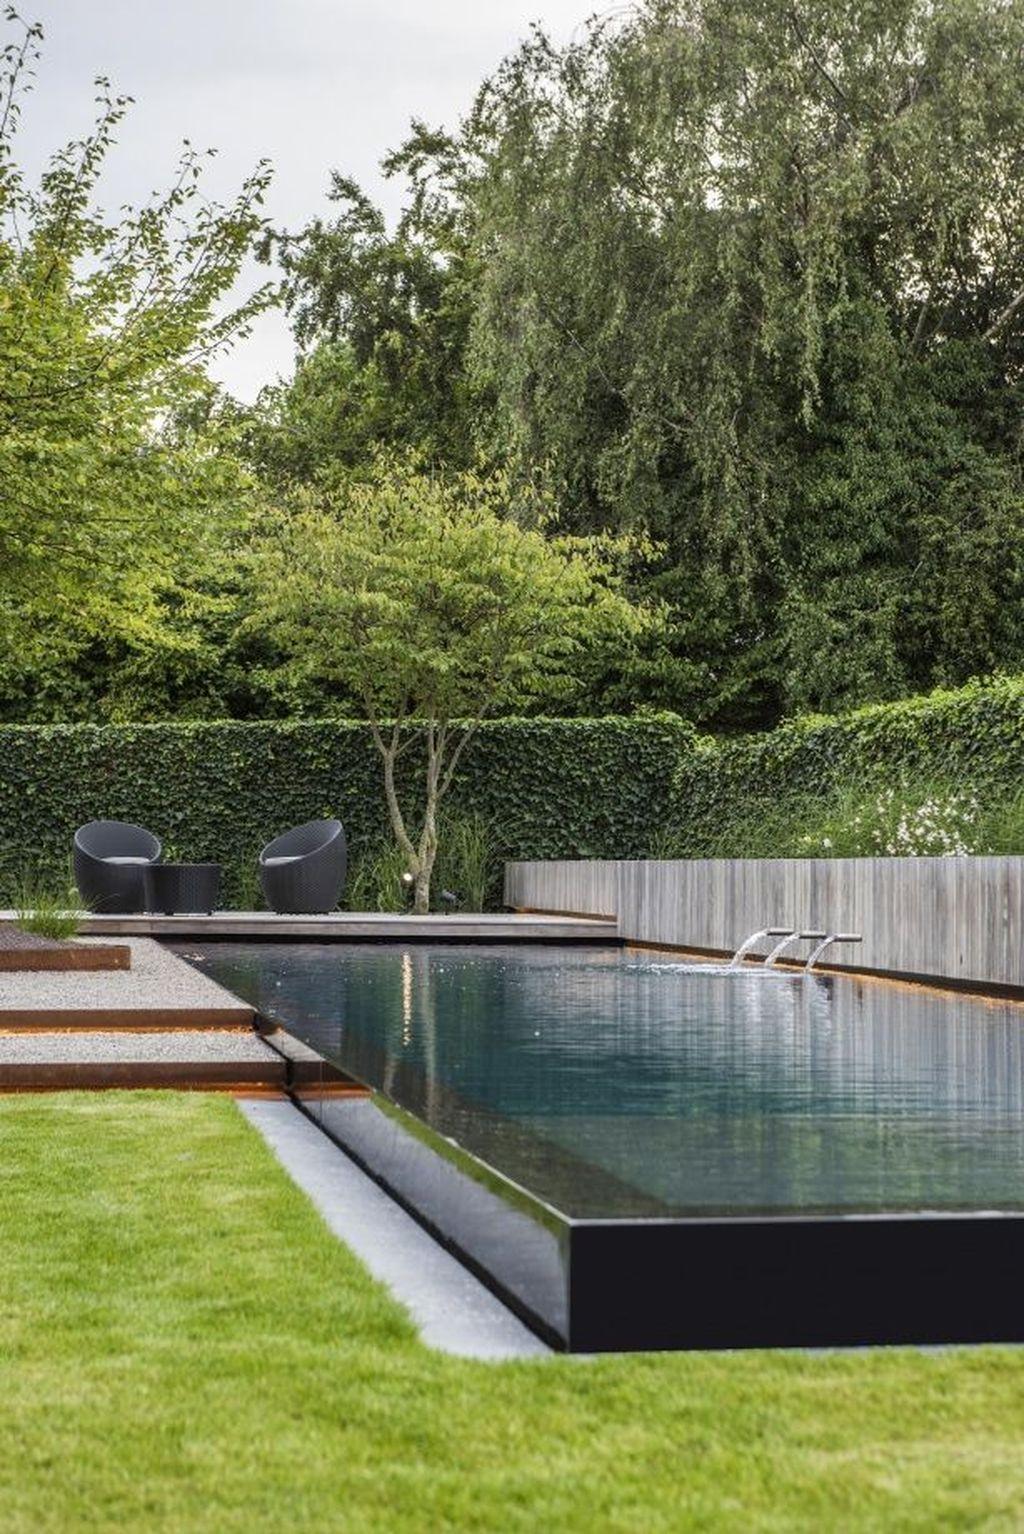 43 Cozy Swimming Pool Garden Design Ideas Pool Landscape Design Swimming Pools Backyard Backyard Pool Designs